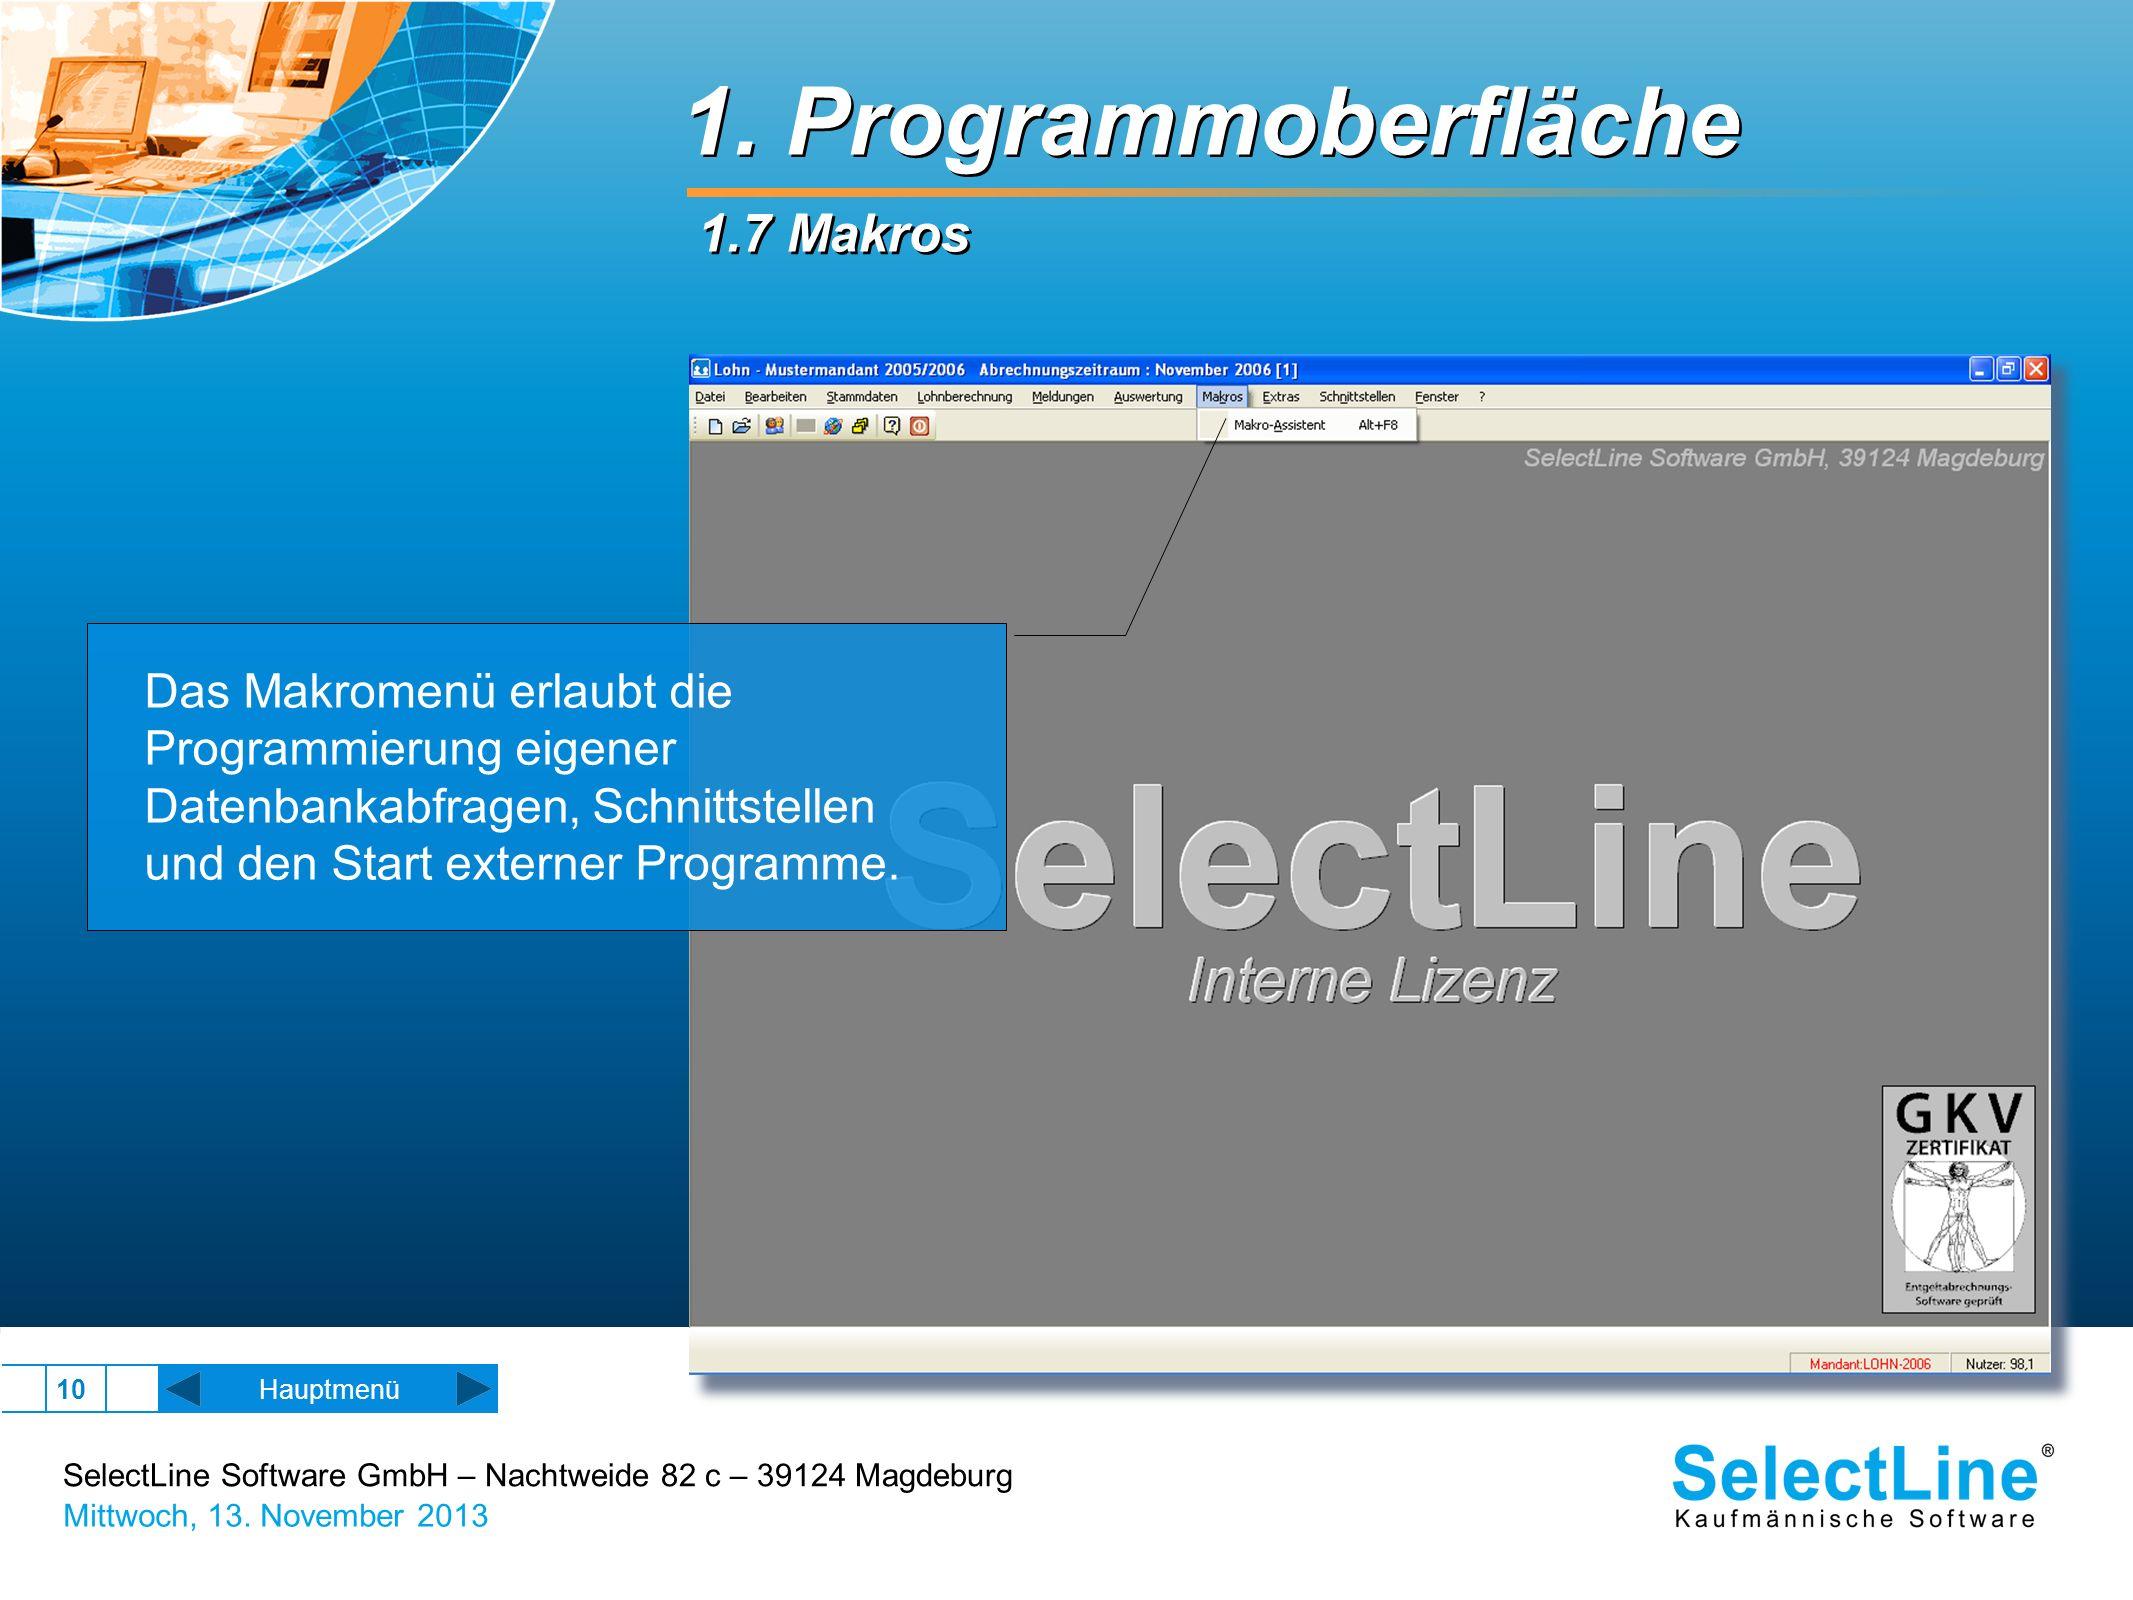 SelectLine Software GmbH – Nachtweide 82 c – 39124 Magdeburg Mittwoch, 13. November 2013 10 1. Programmoberfläche 1.7 Makros Hauptmenü Das Makromenü e